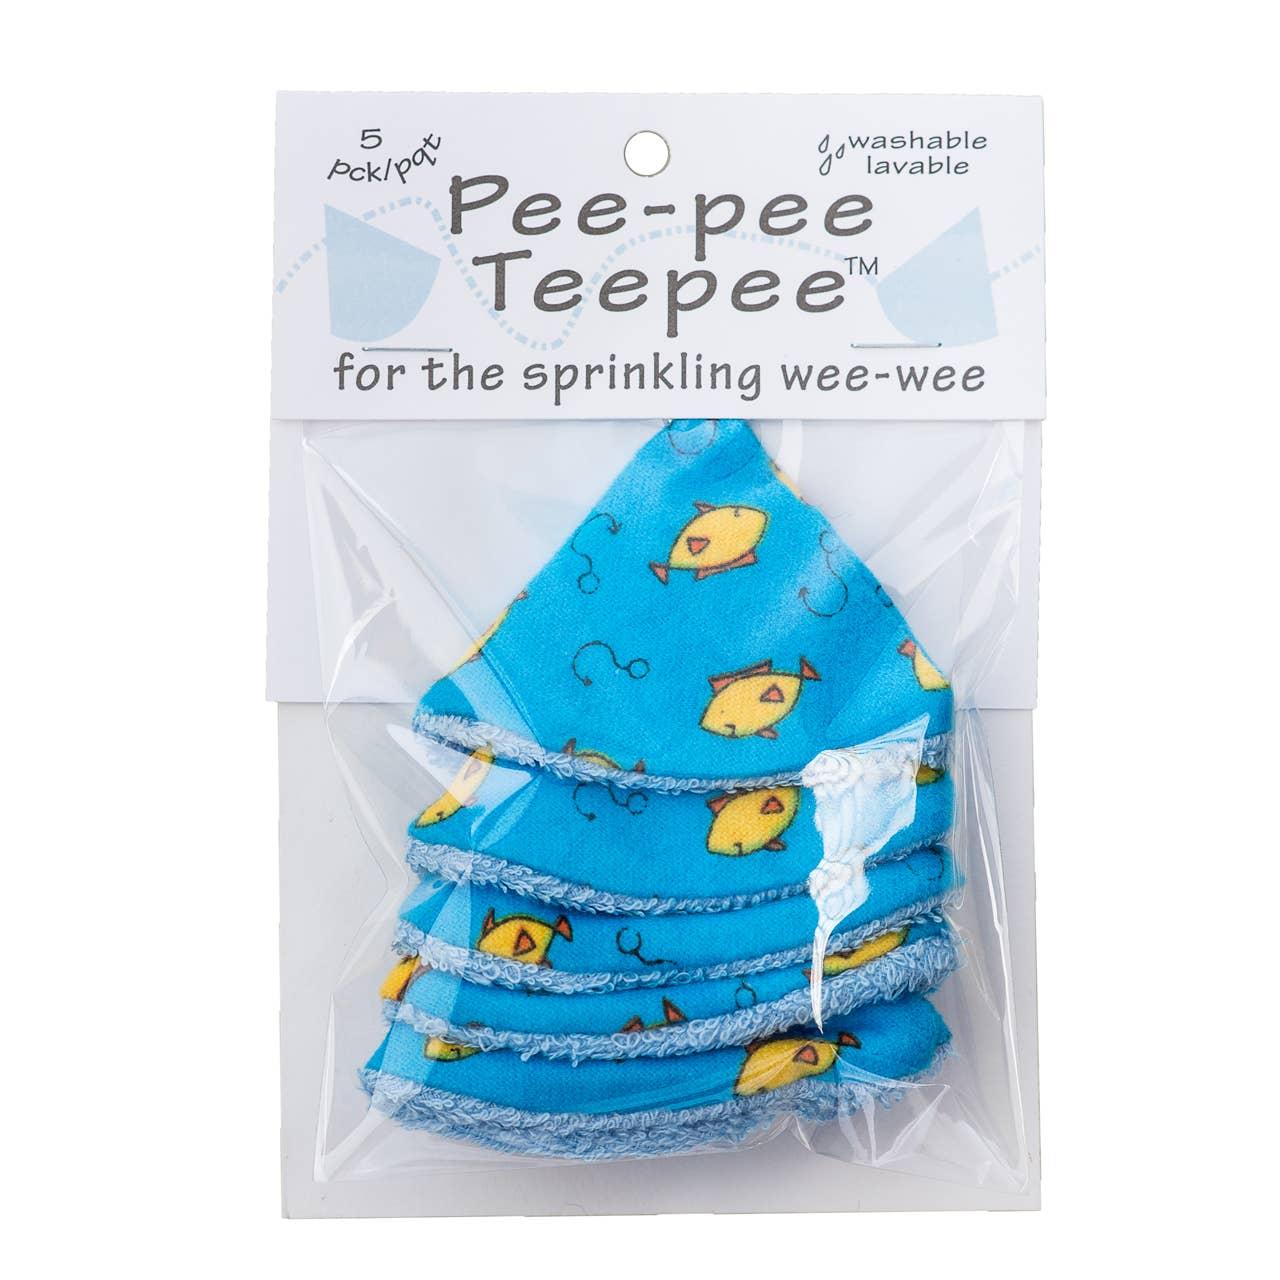 Cello Bag Pee-pee Teepee Wild West Blue